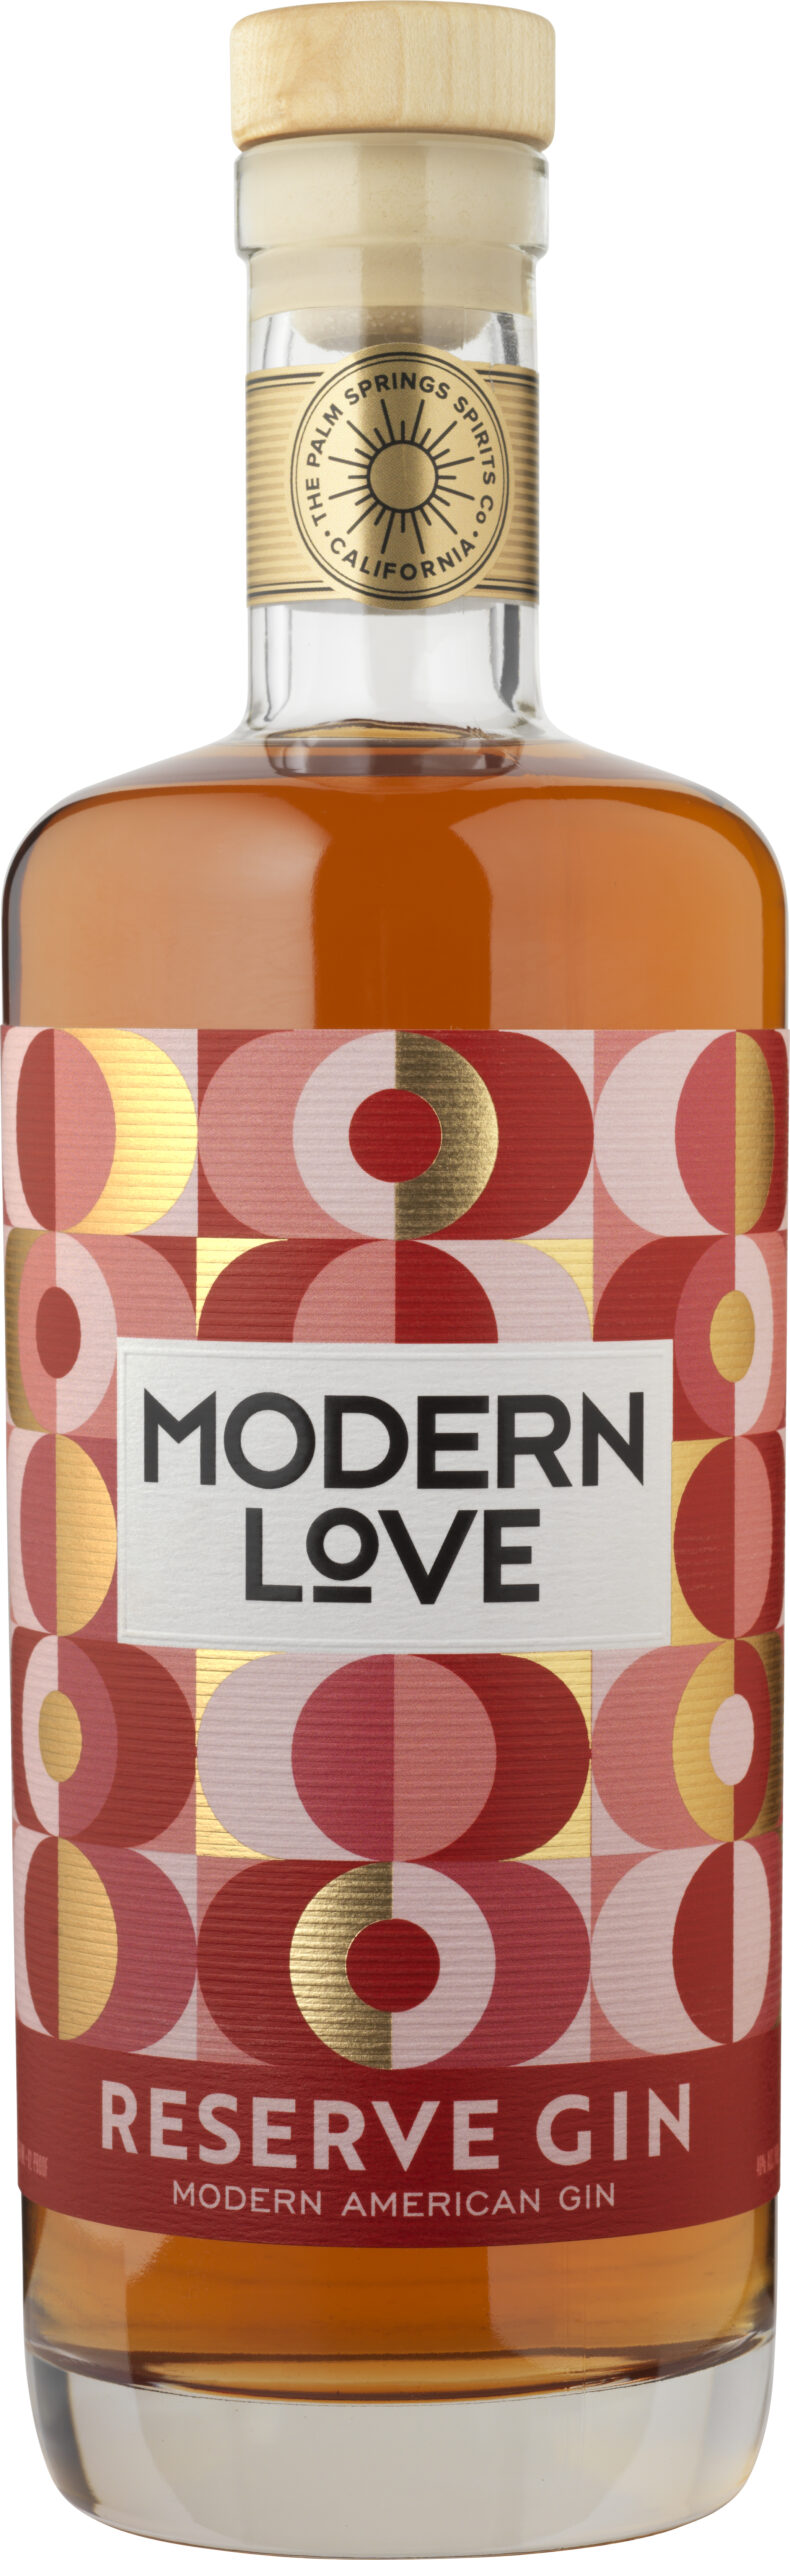 Modern_Love_Reserve_Gin_so_FA